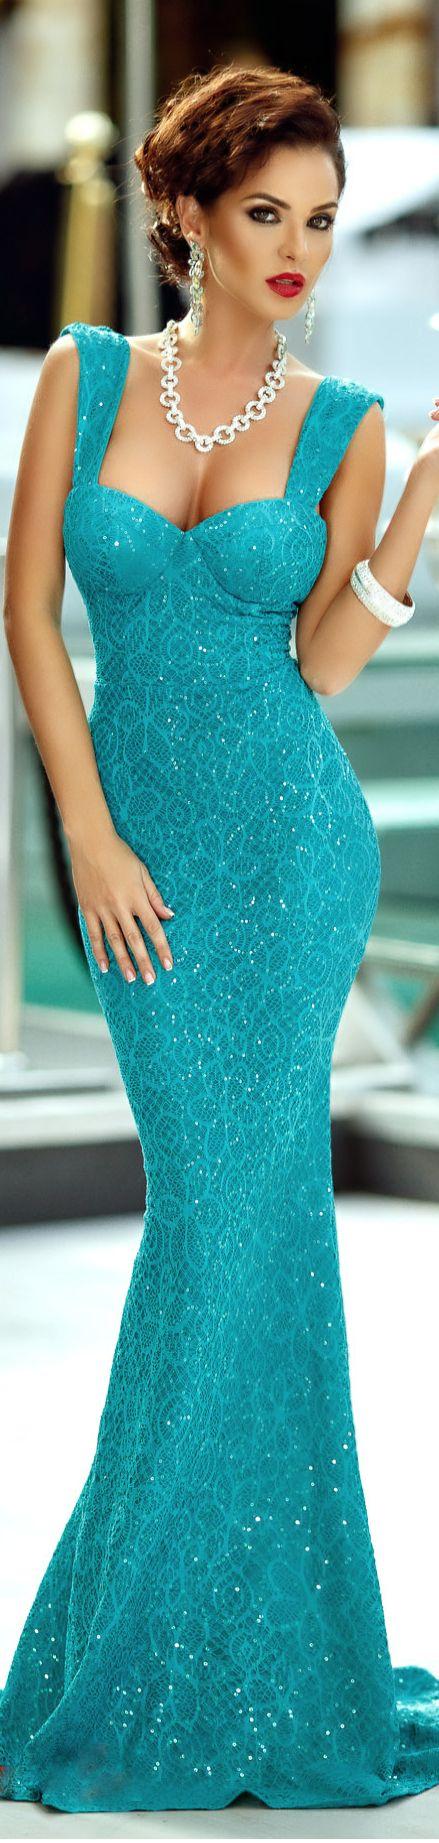 Dress with sequined lace turquoise kiyafetler pinterest